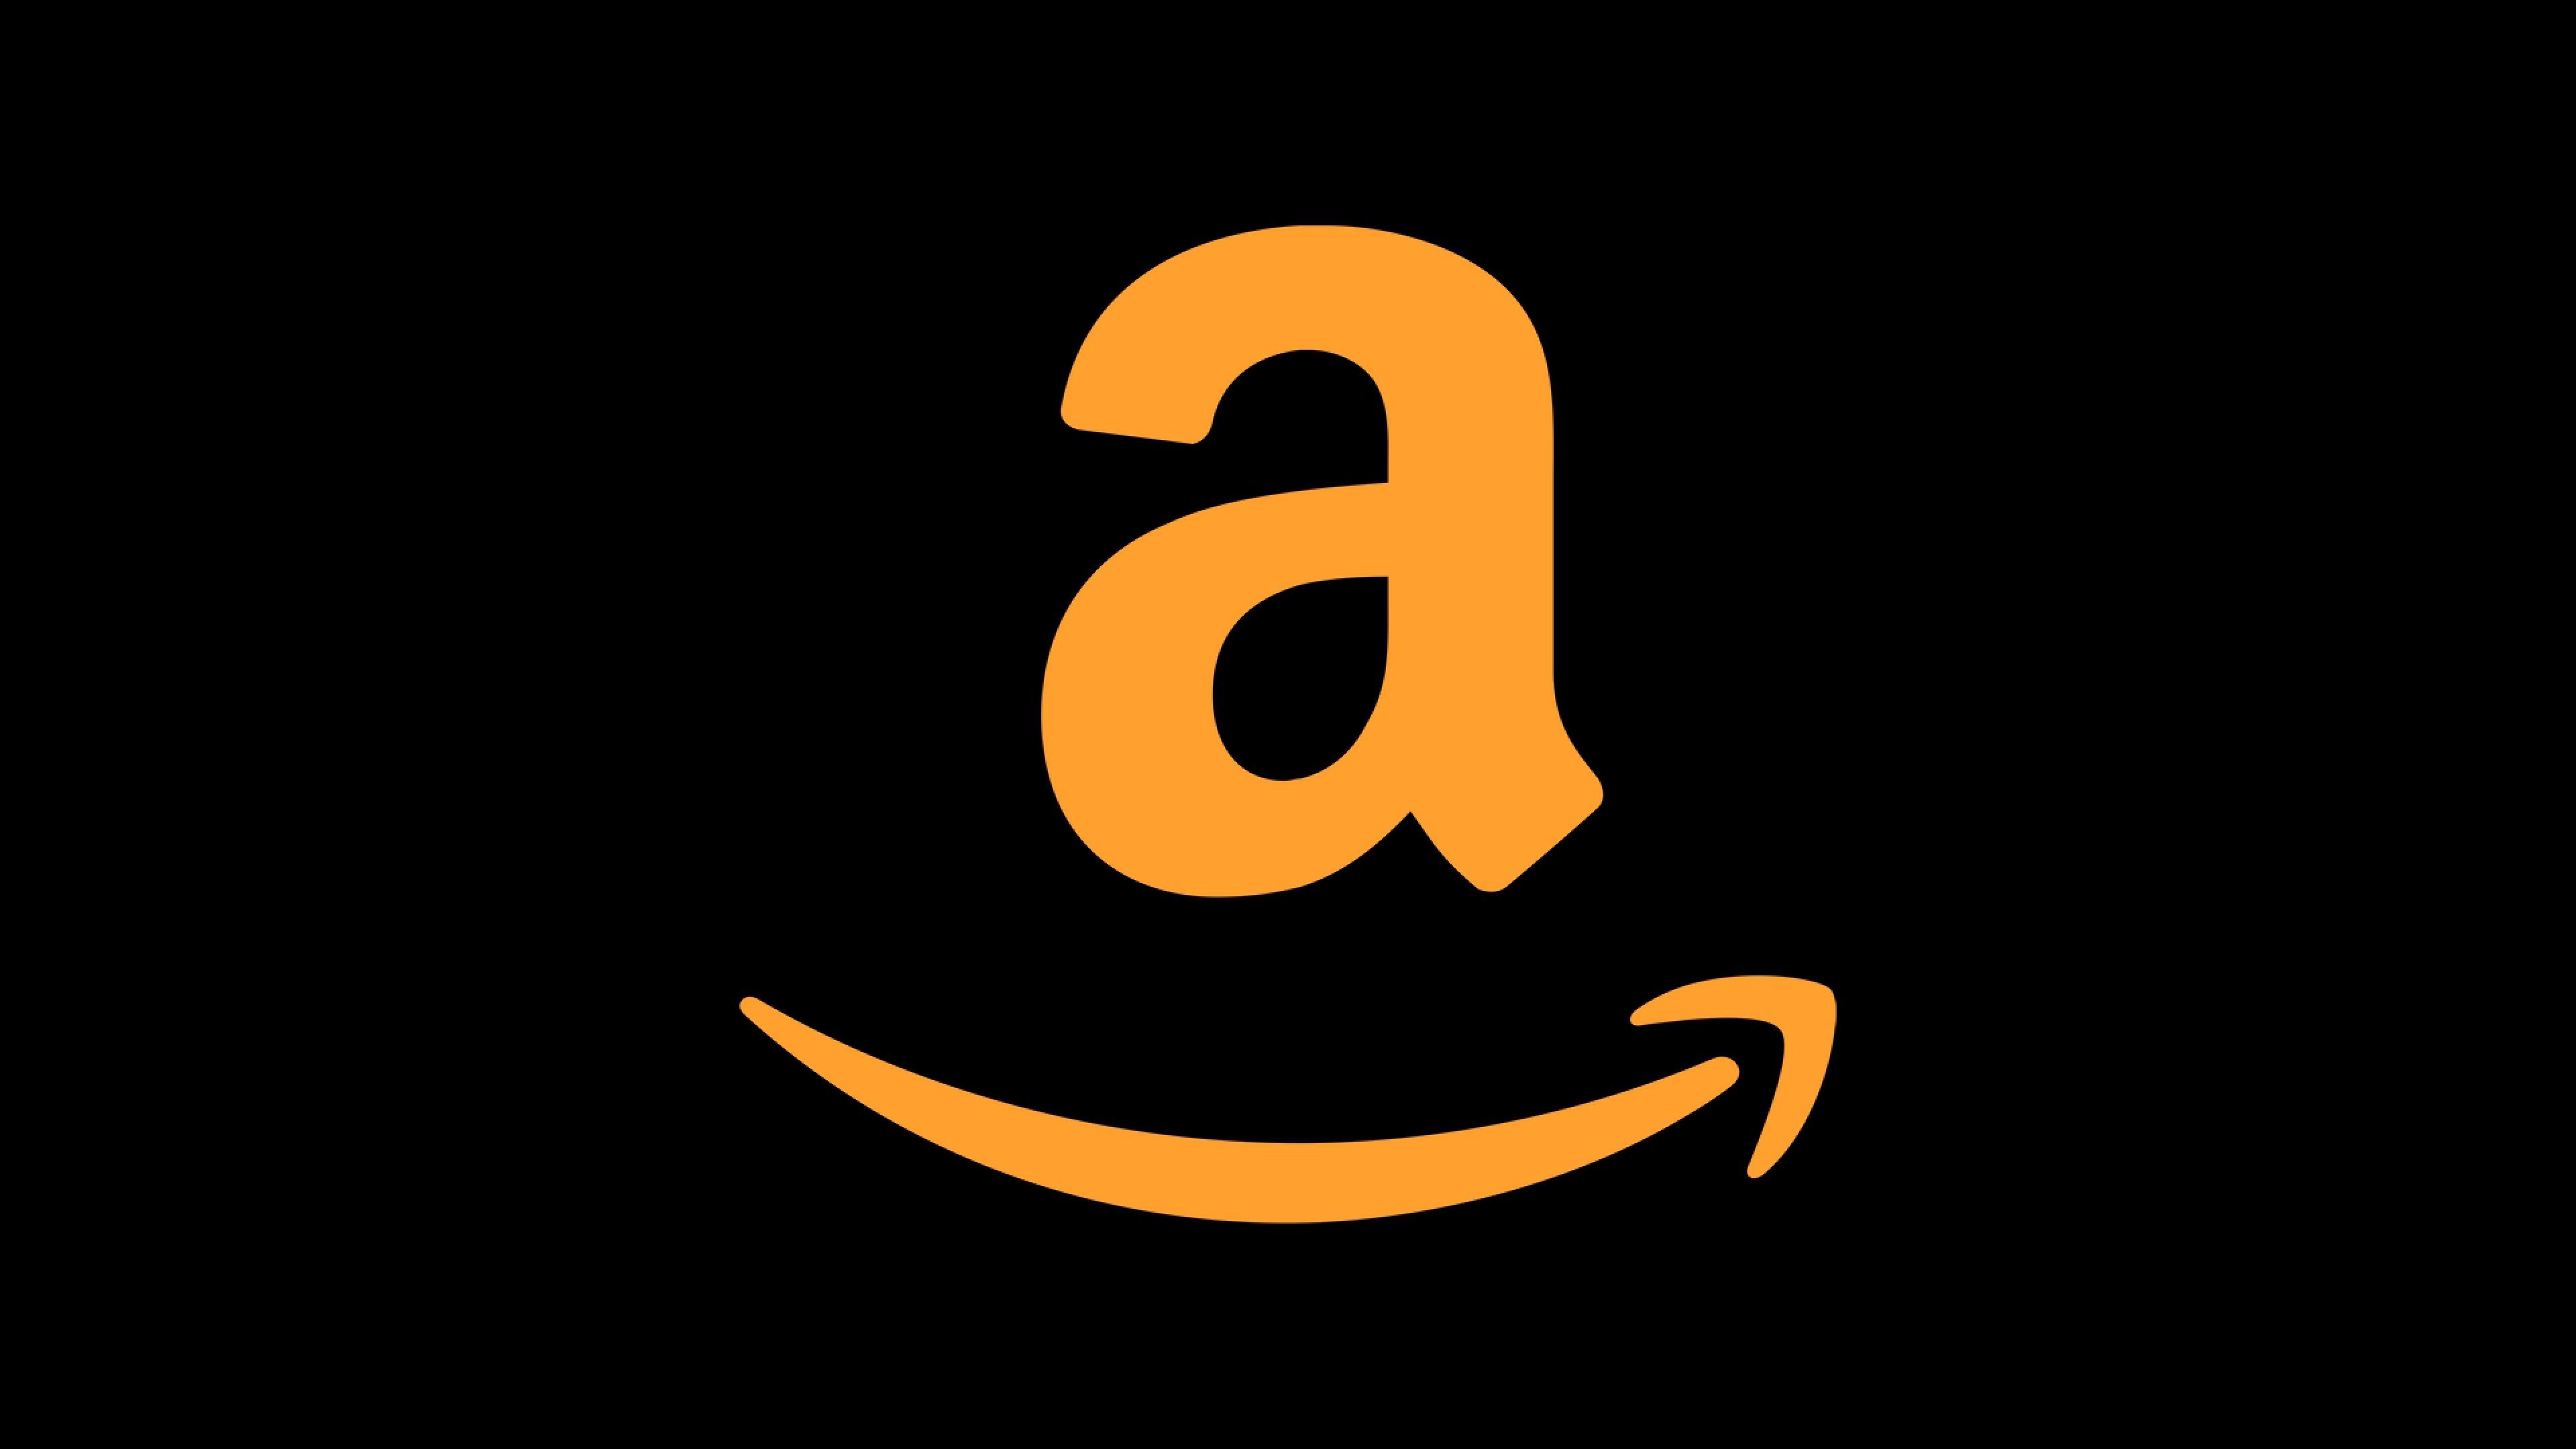 Cute Wallpapers 1366x768 Amazon 4k Logo Hd Logo 4k Wallpapers Images